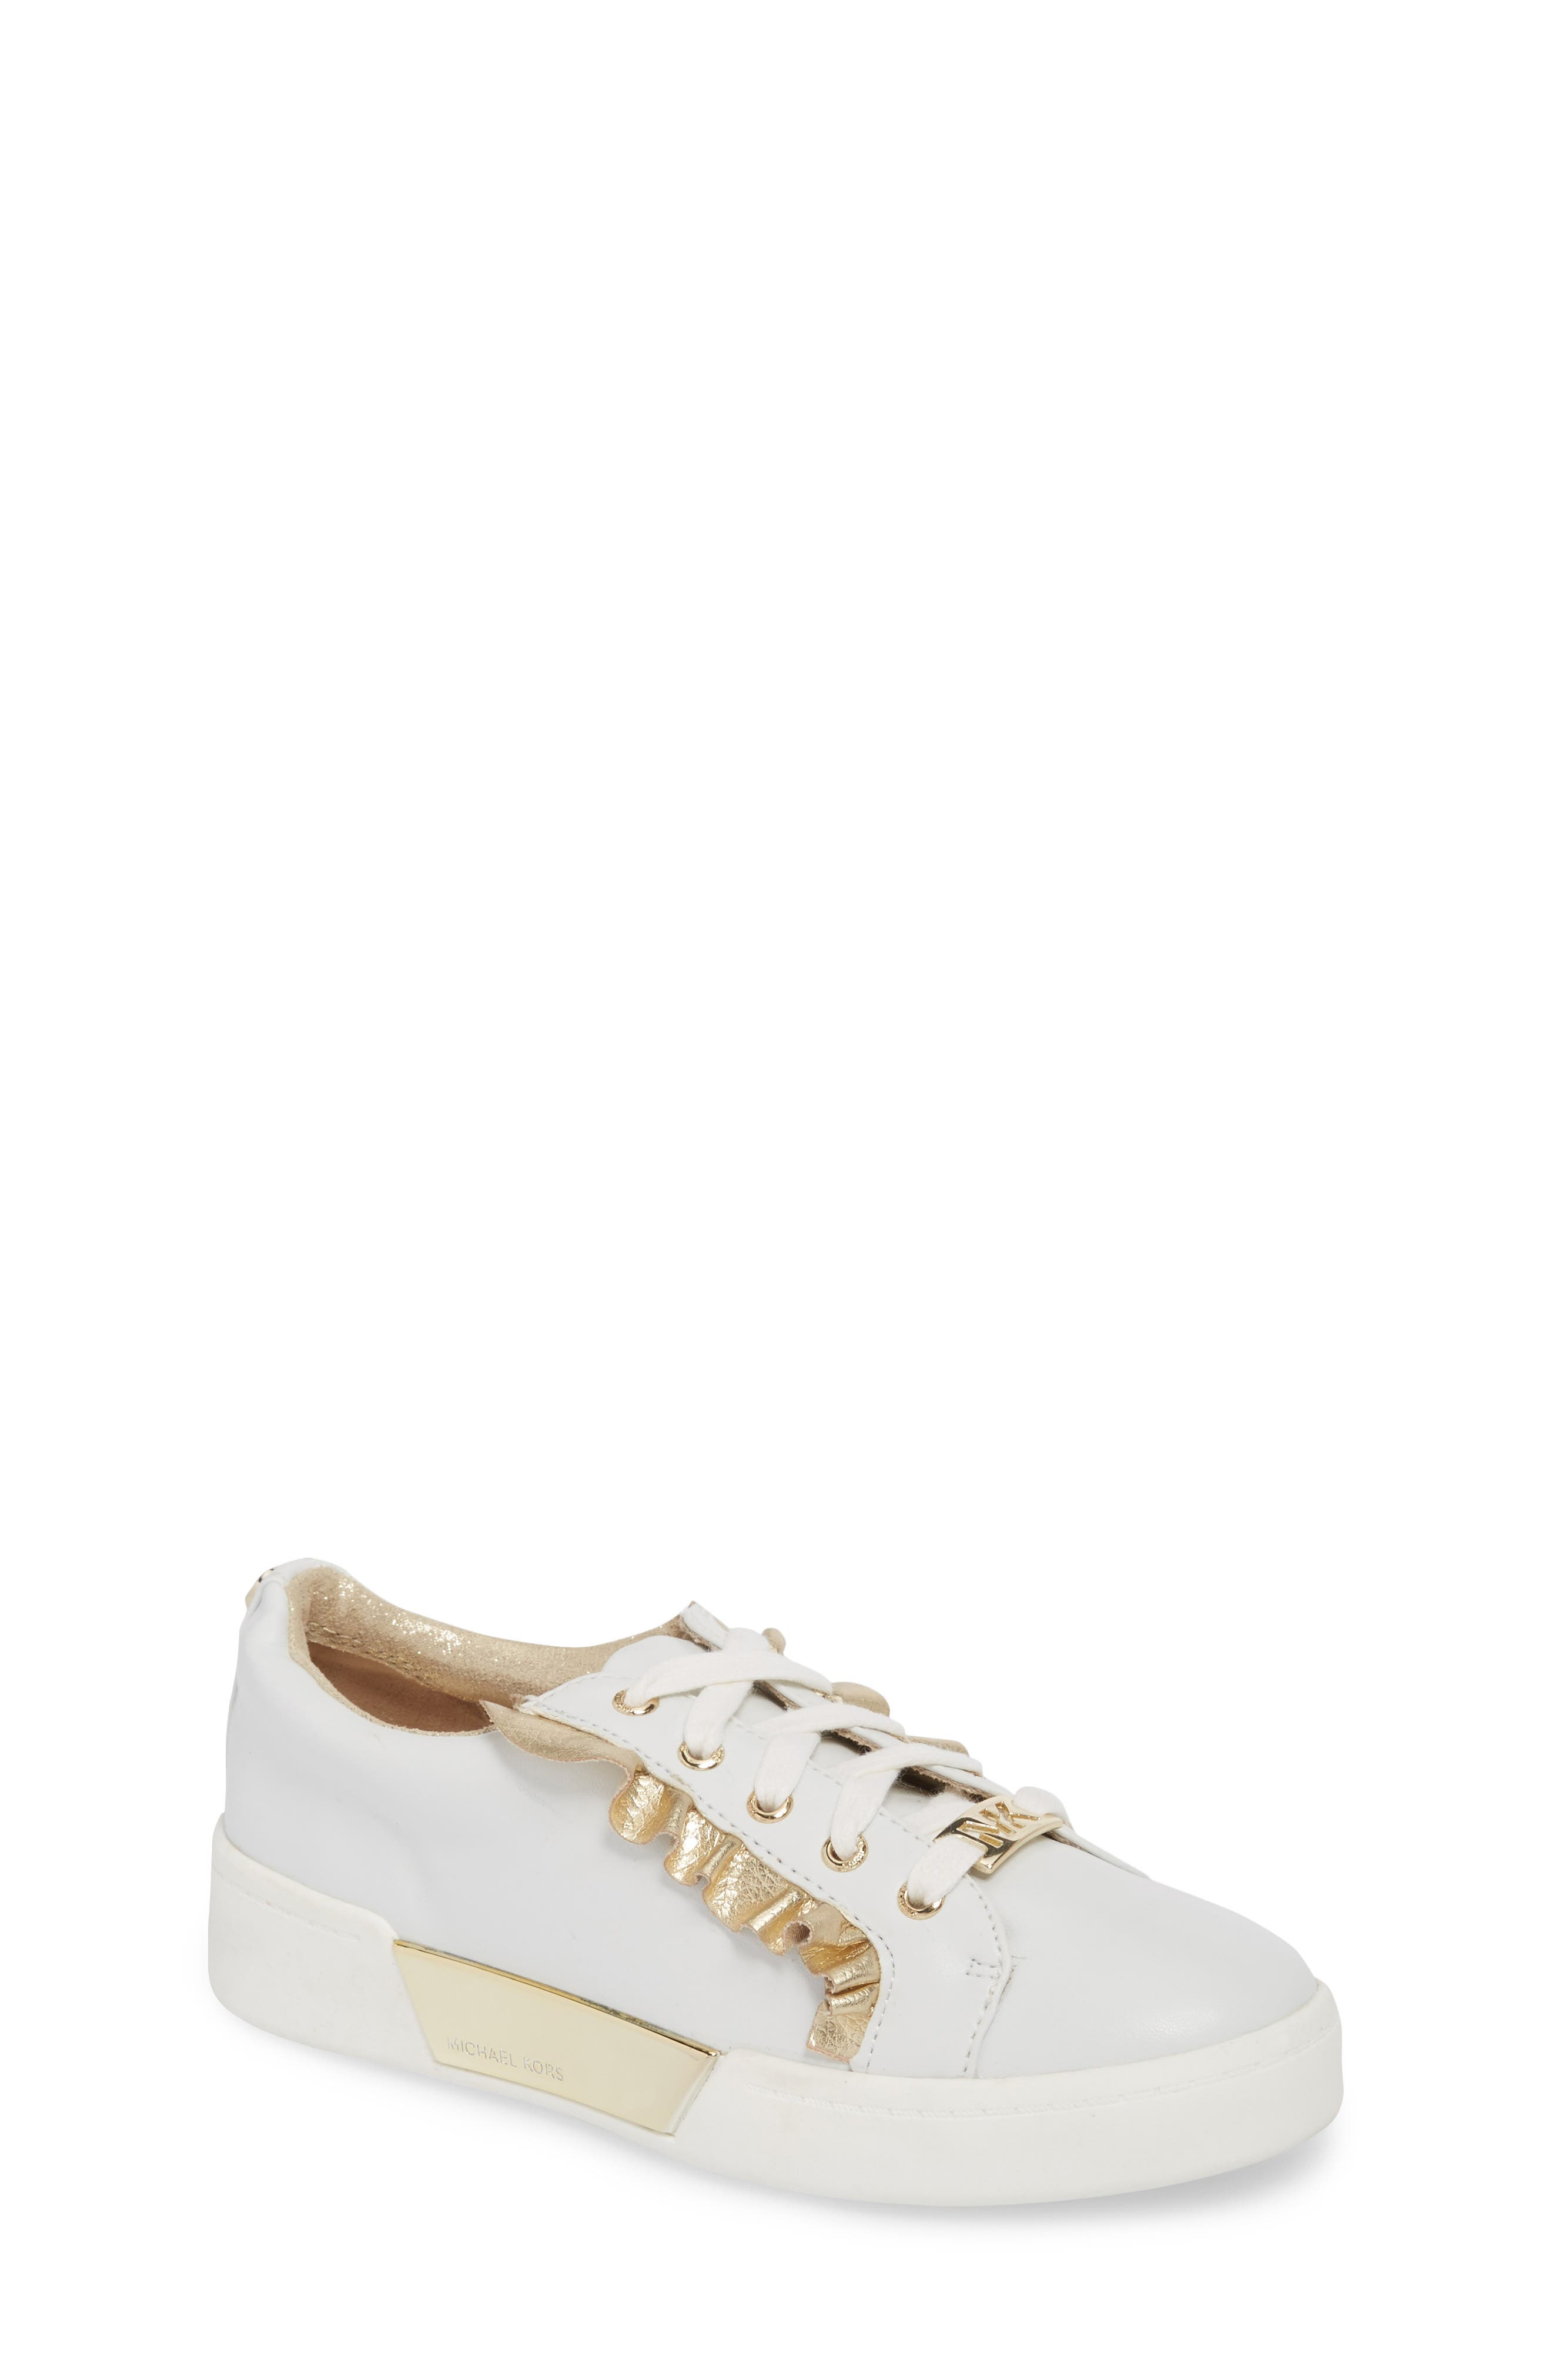 Guard Rail Sneaker,                             Main thumbnail 1, color,                             White